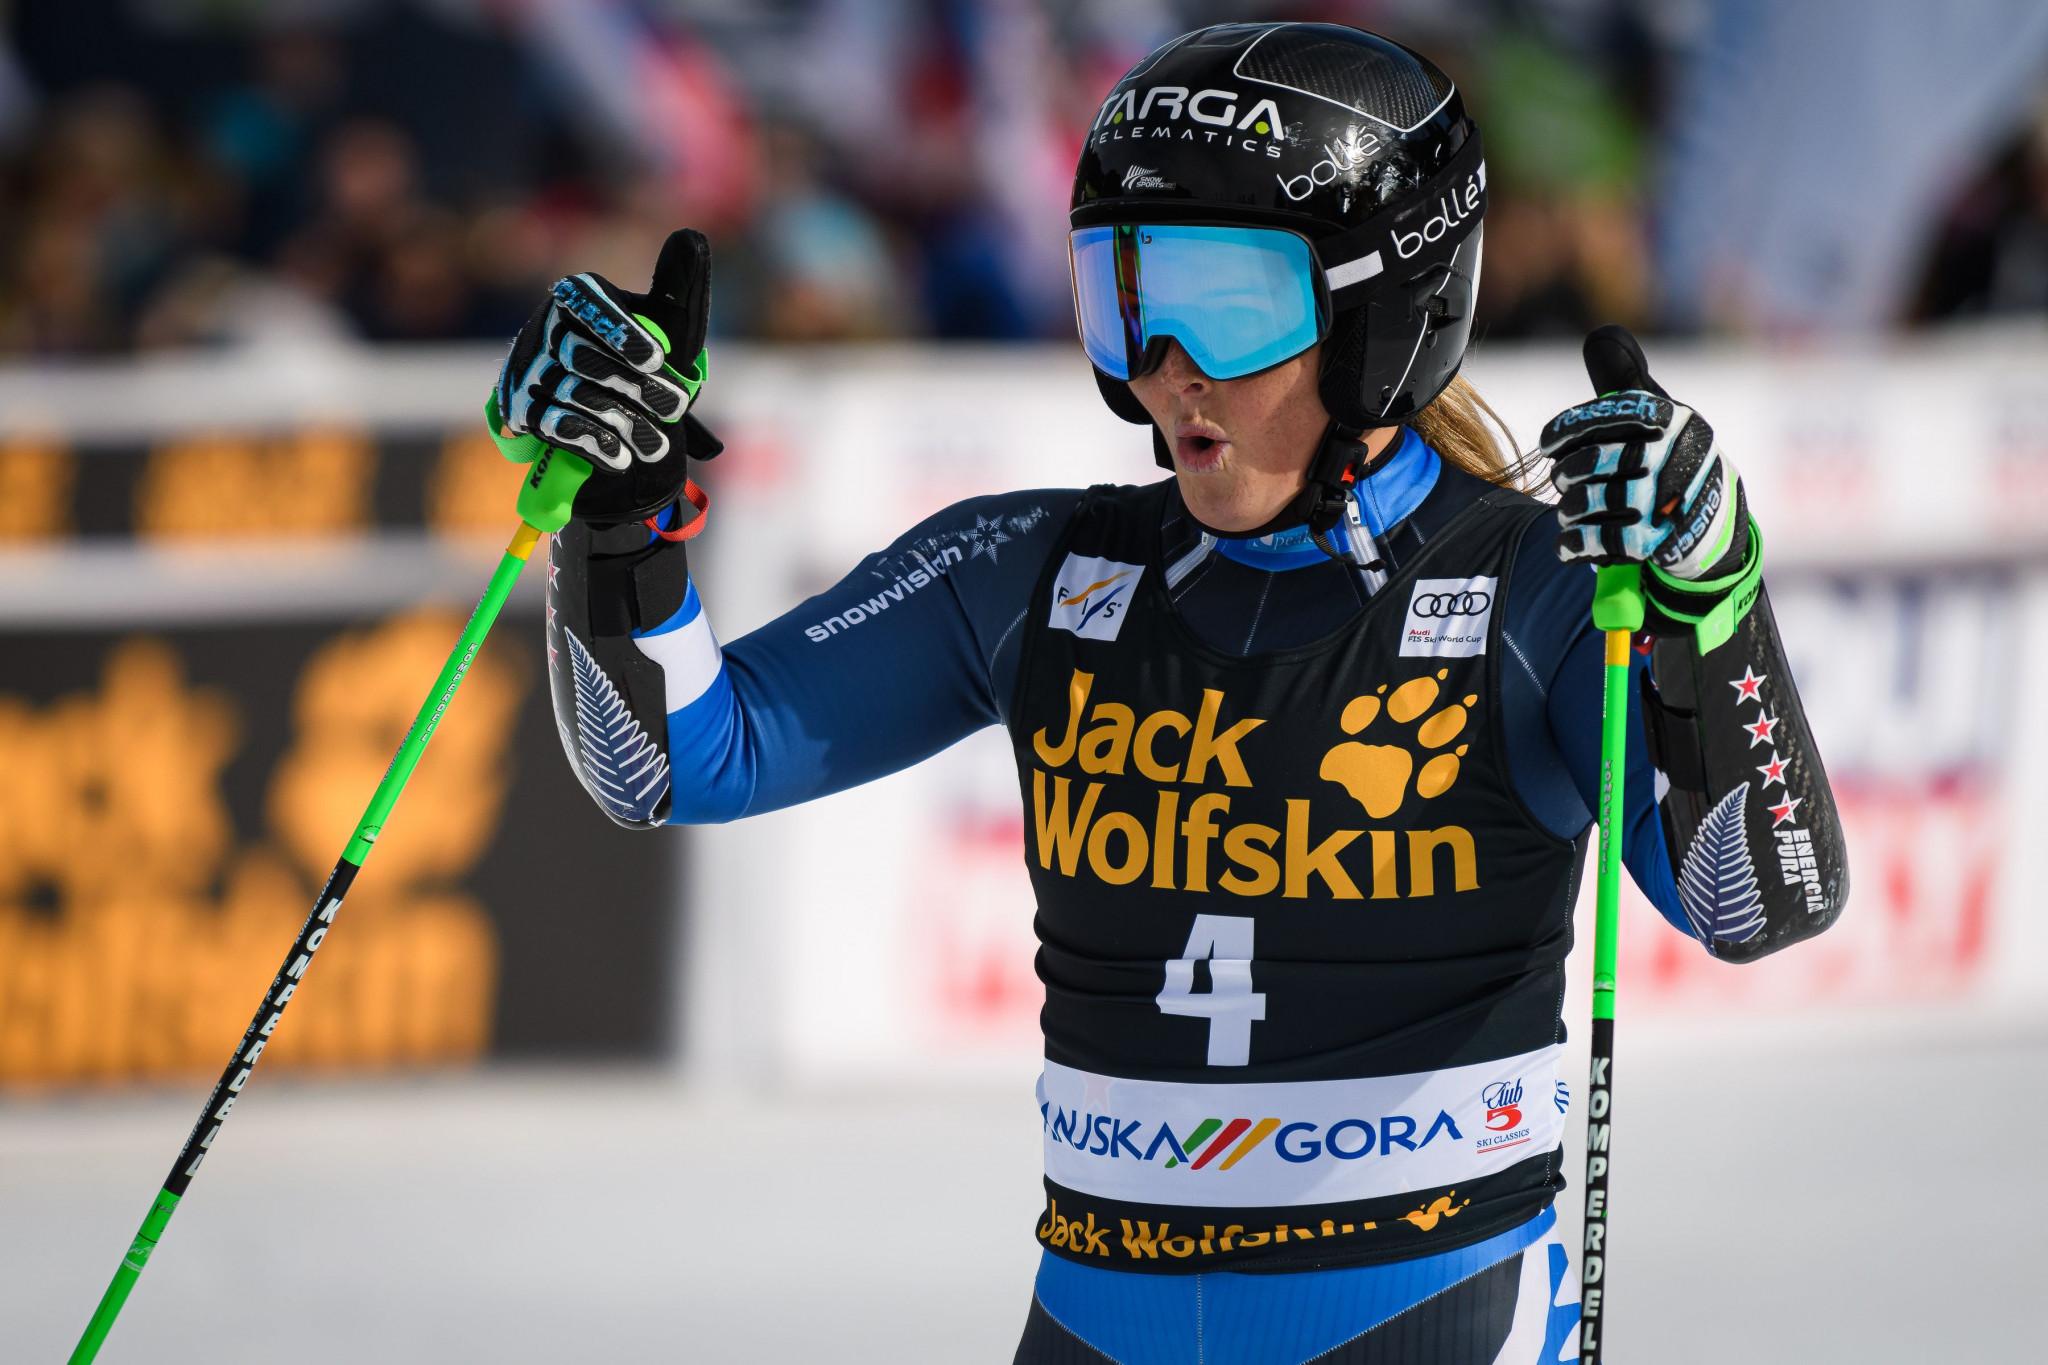 Teenager Robinson earns second FIS Alpine Ski World Cup win at Kranjska Gora